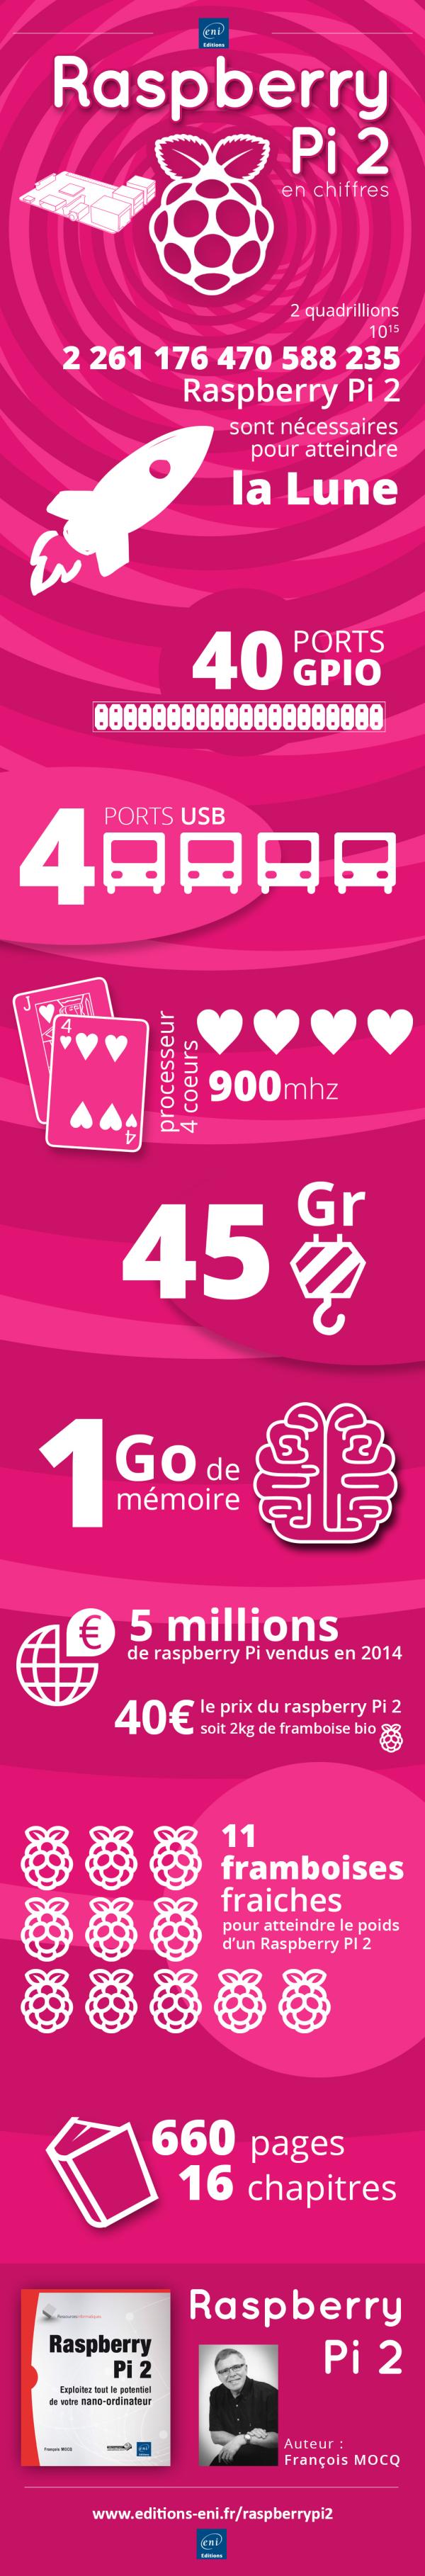 infographieRaspberryPI2_600px